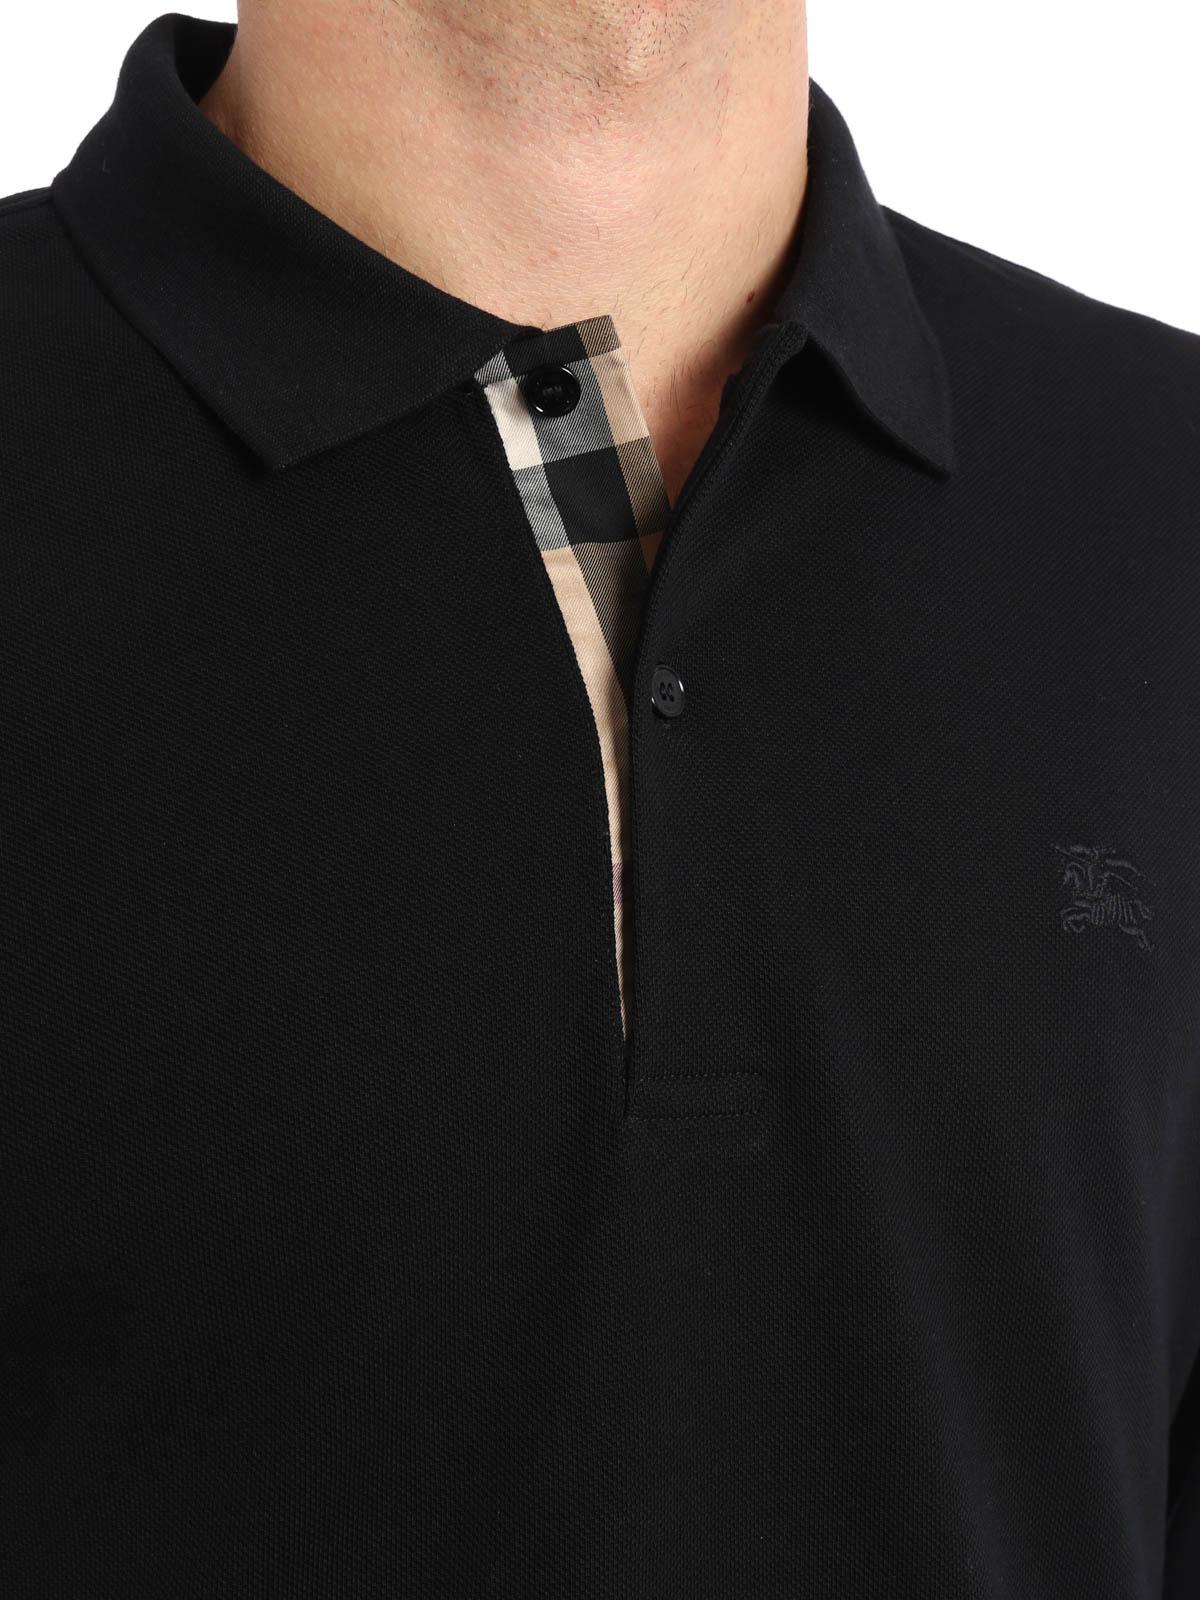 f4fb835537b4 Burberry - Polo Noir Pour Homme - Polos - 3982164   iKRIX.com